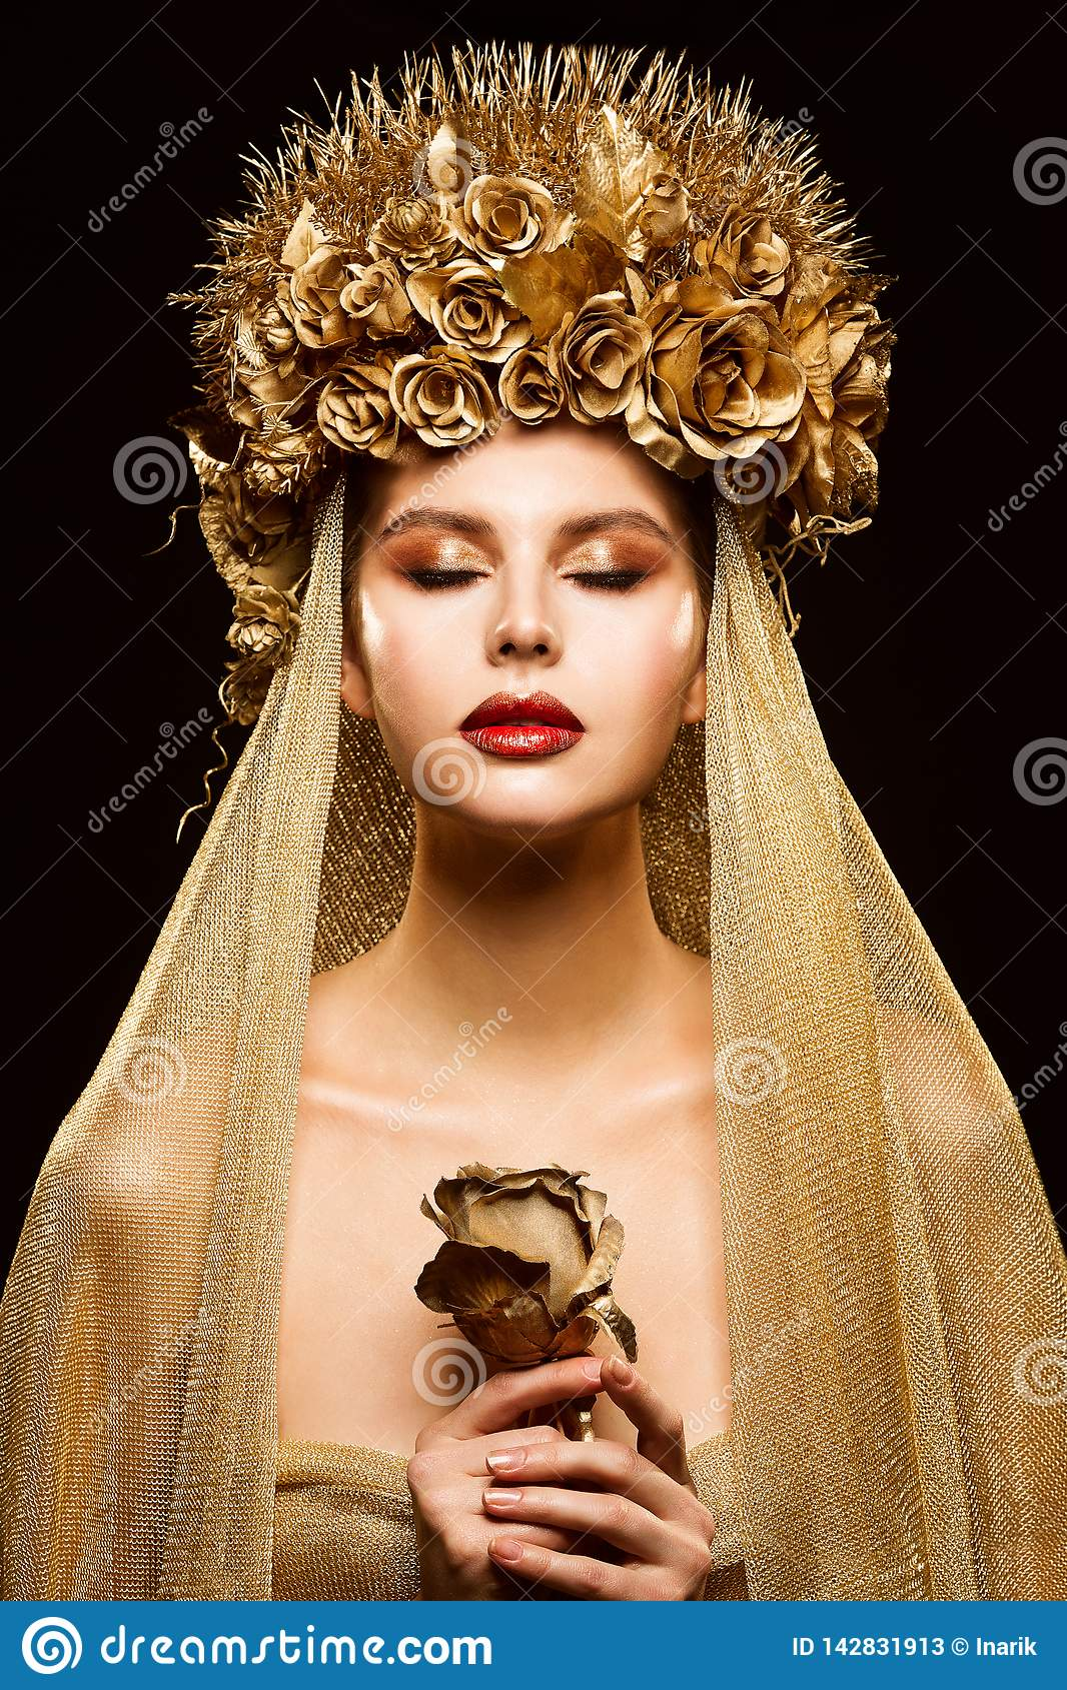 Mulher na coroa da flor do ouro, modelo de forma Beauty Makeup, noiva no véu dourado que guarda Rosa